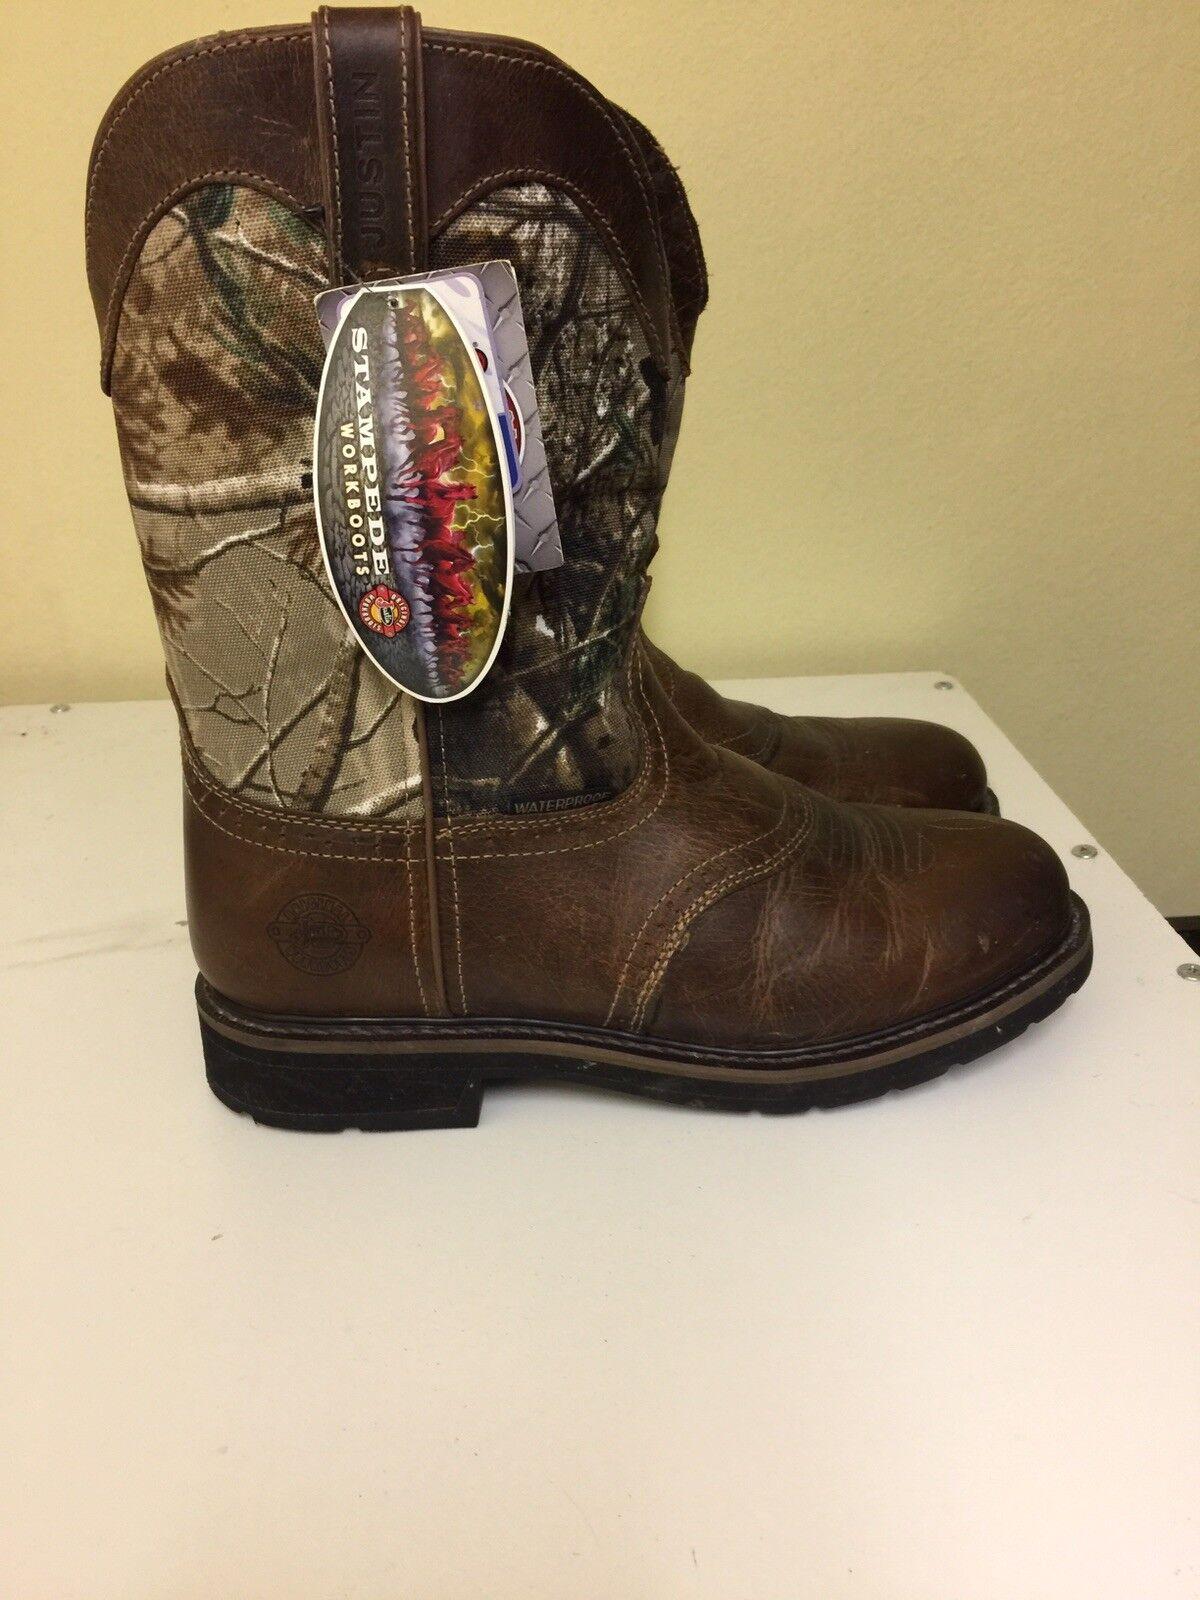 Justin Original Work Boots Stampede Round Toe Boots, Men's - Size 10.5 D, Brown